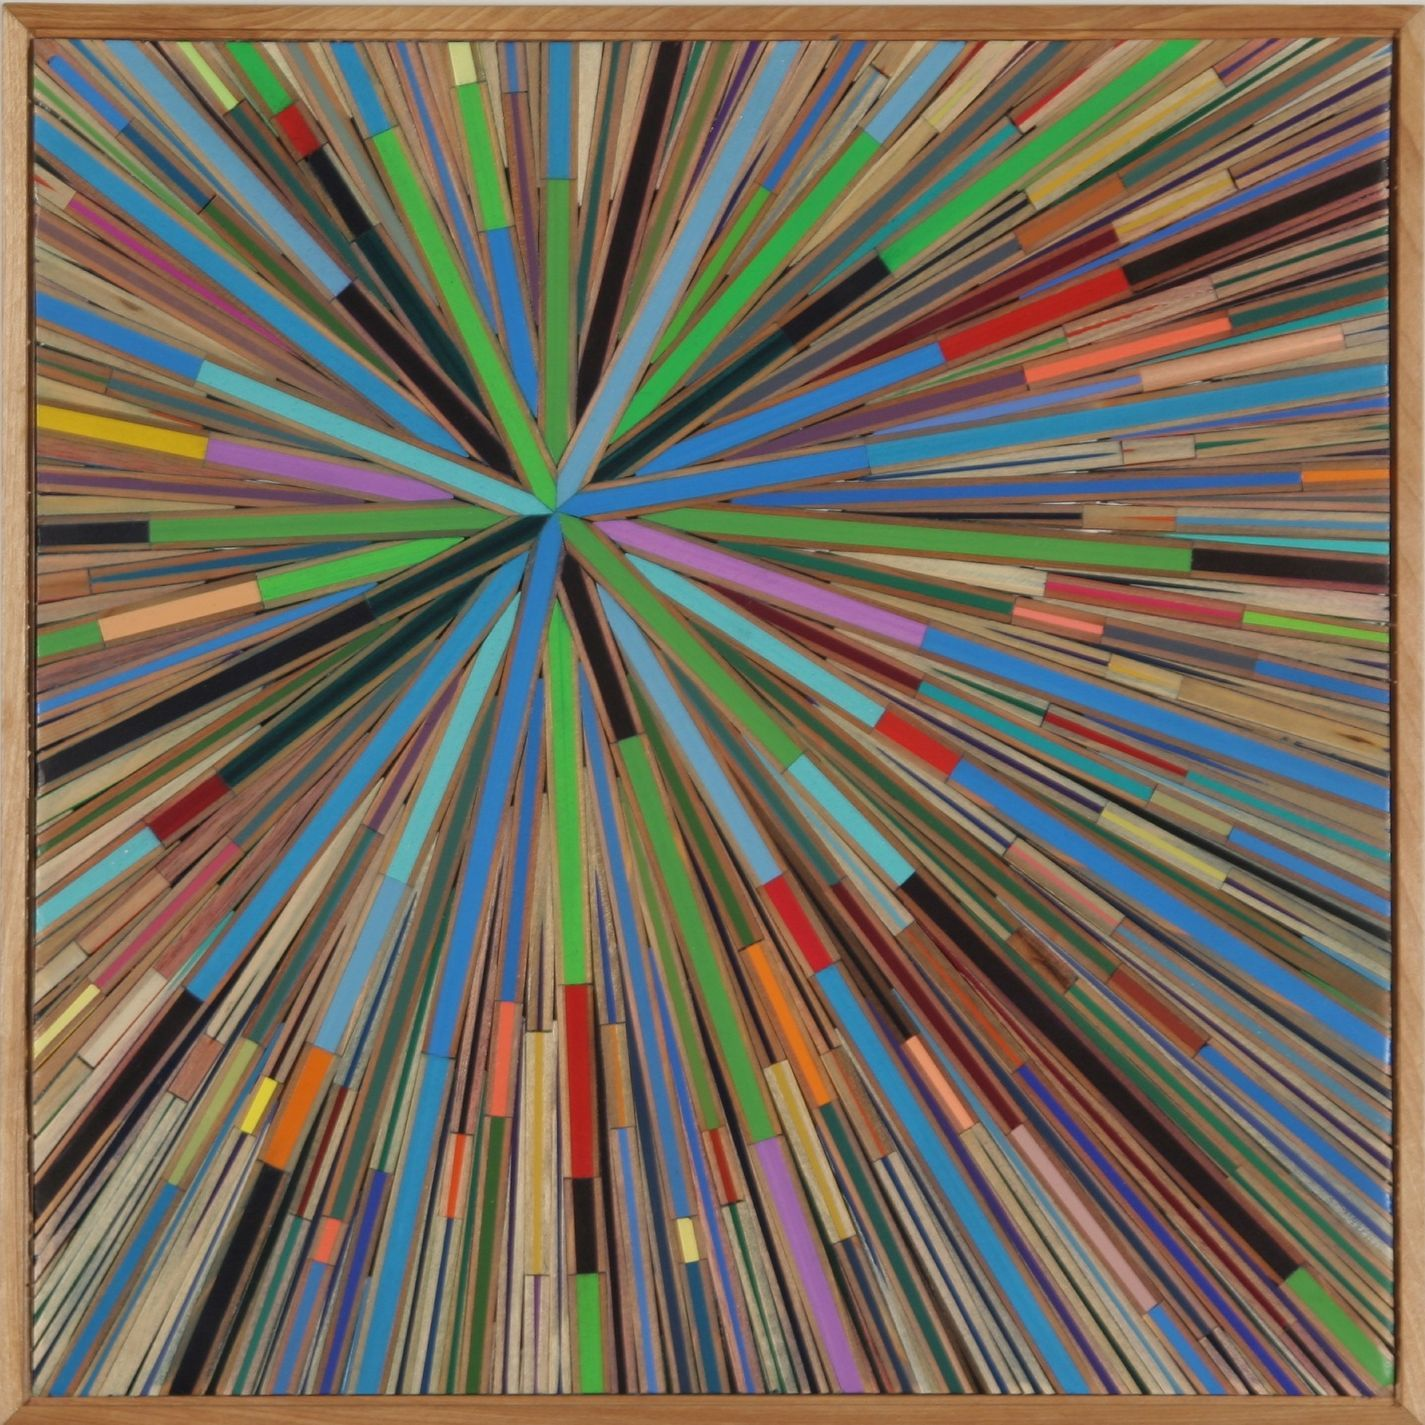 "David Poppie - orbit  15"" x 15""  colored pencils  2008"